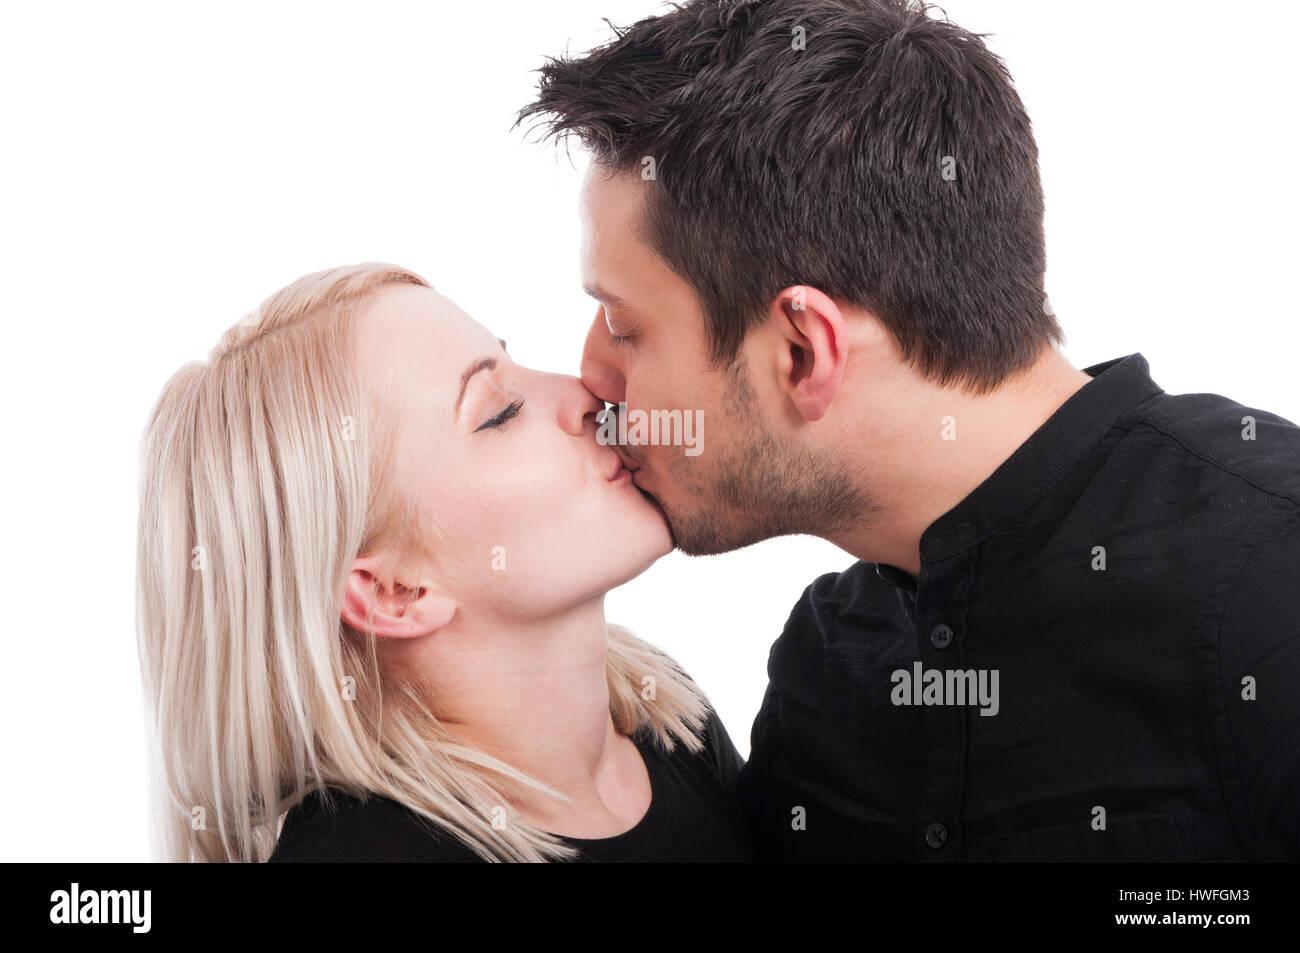 nude boy and girl kissing